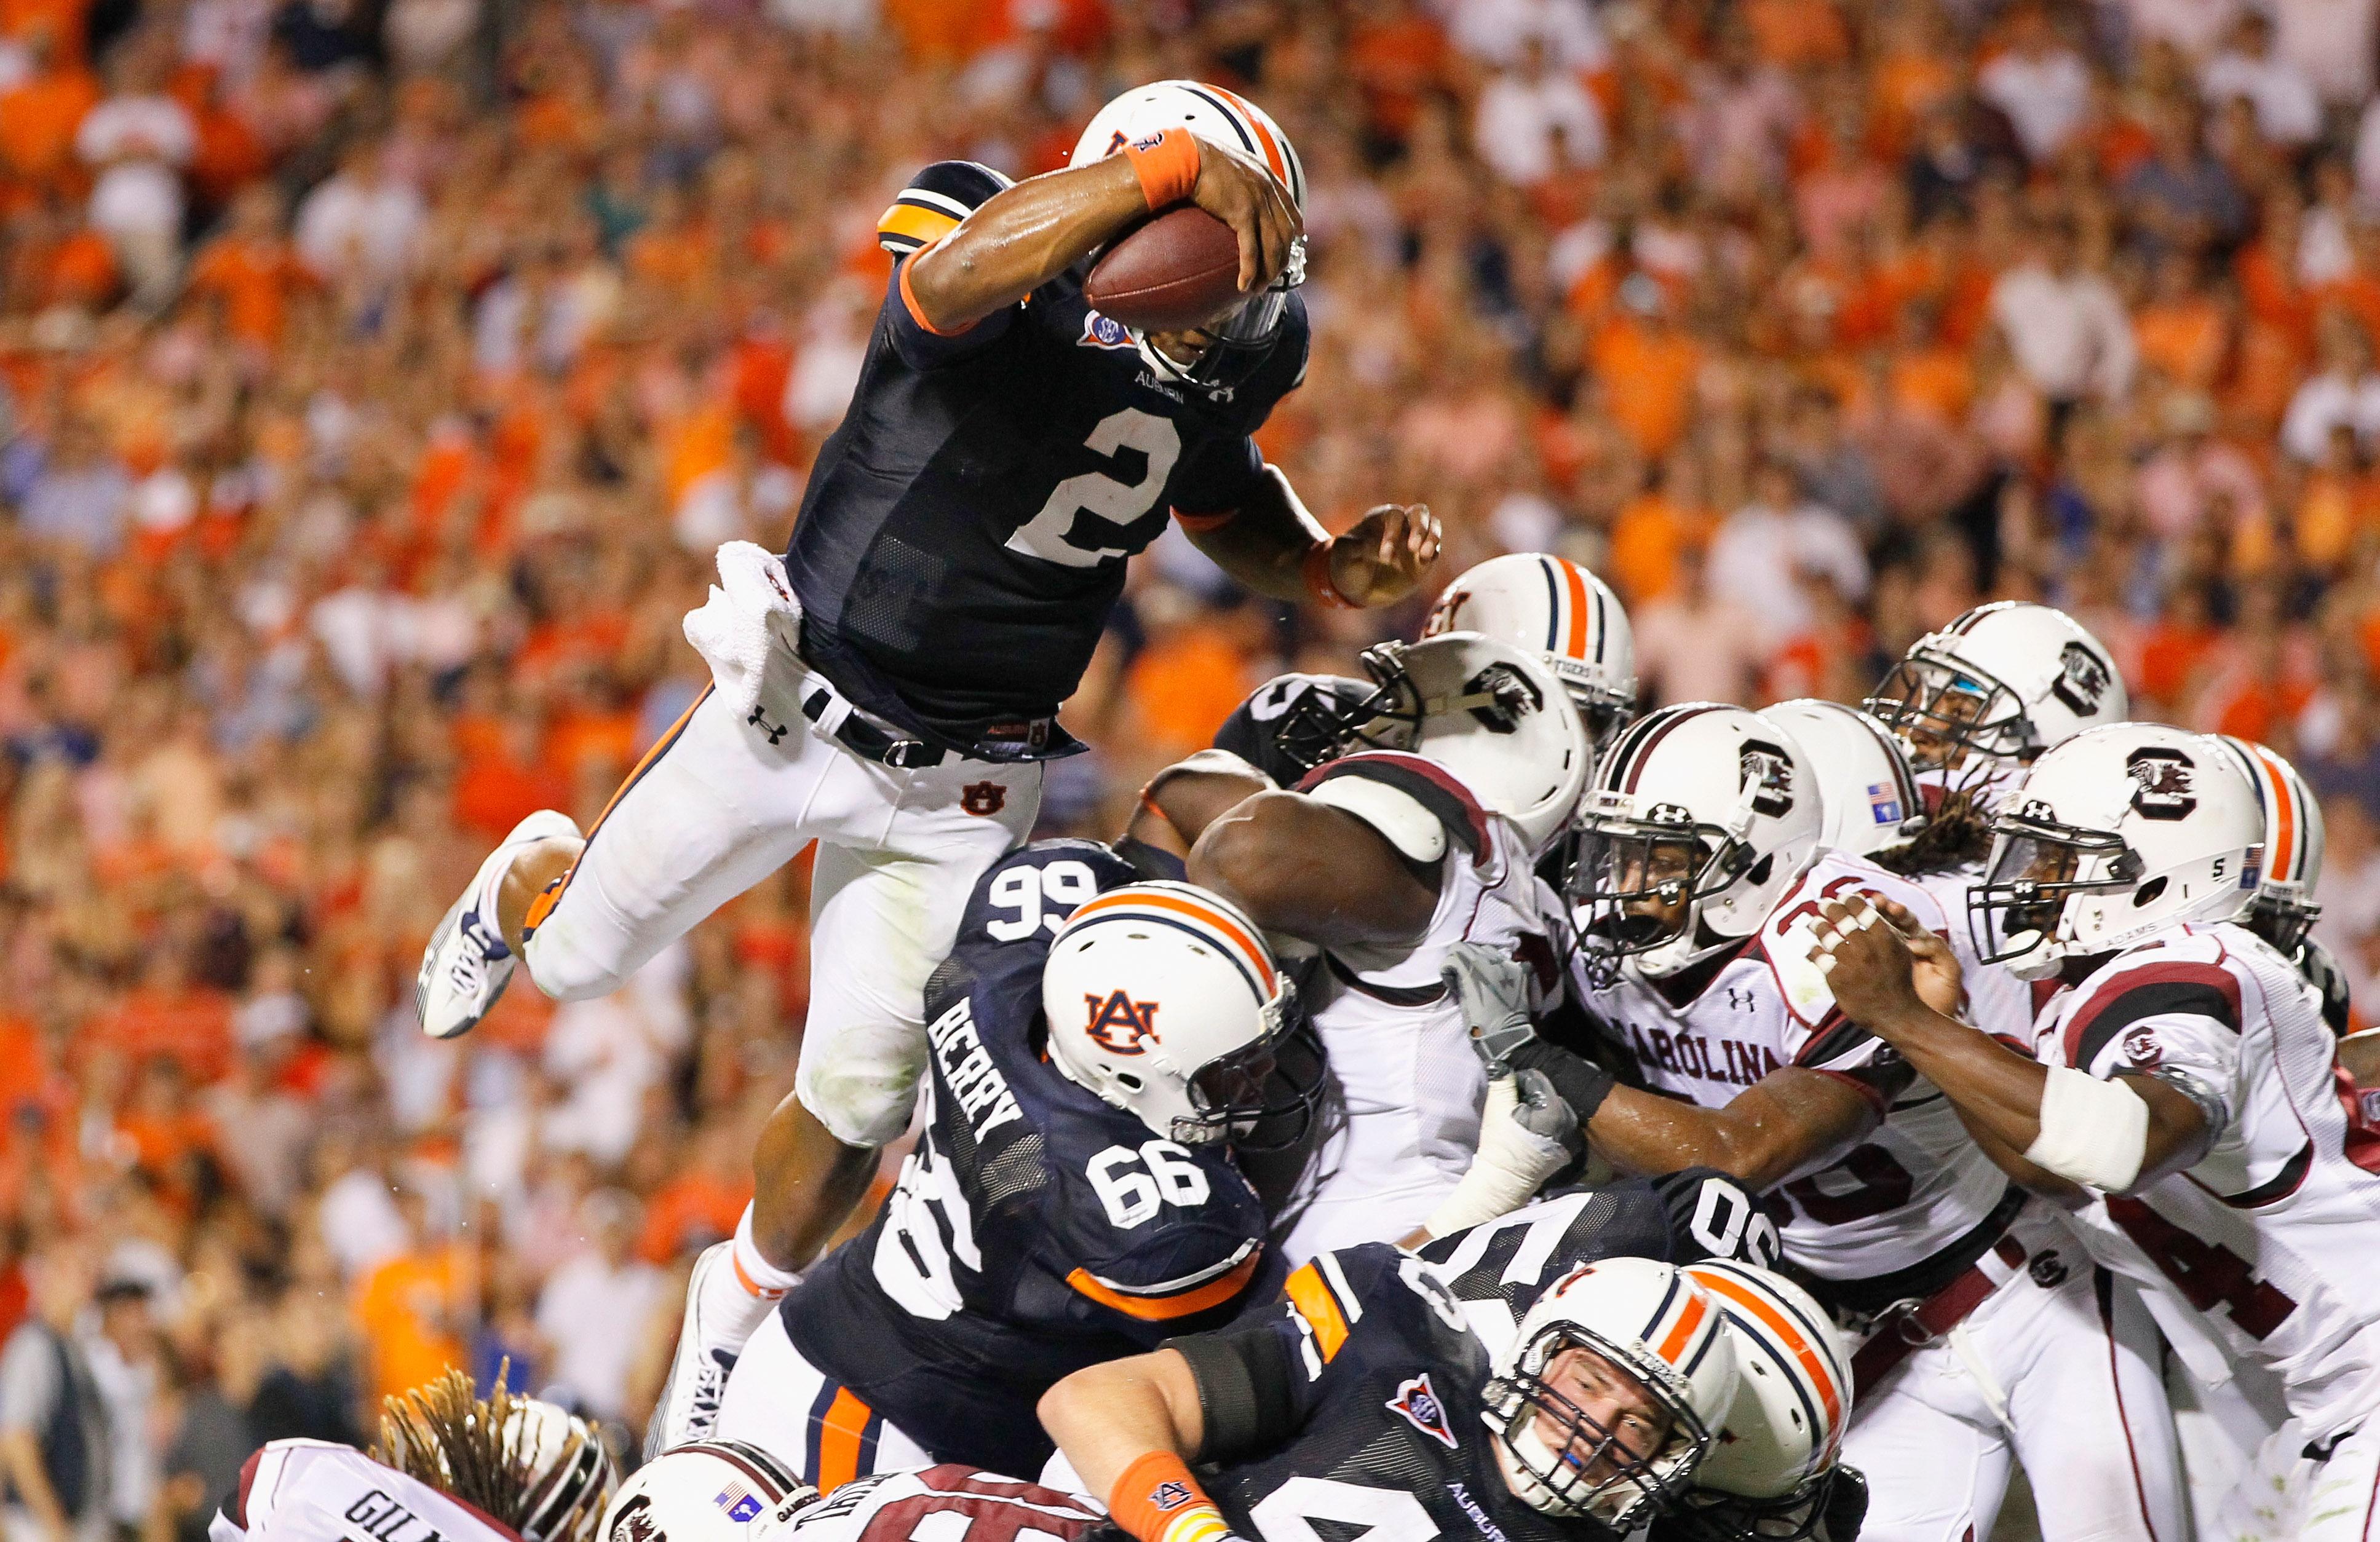 Auburn QB Cameron Newton, SEC leading rusher